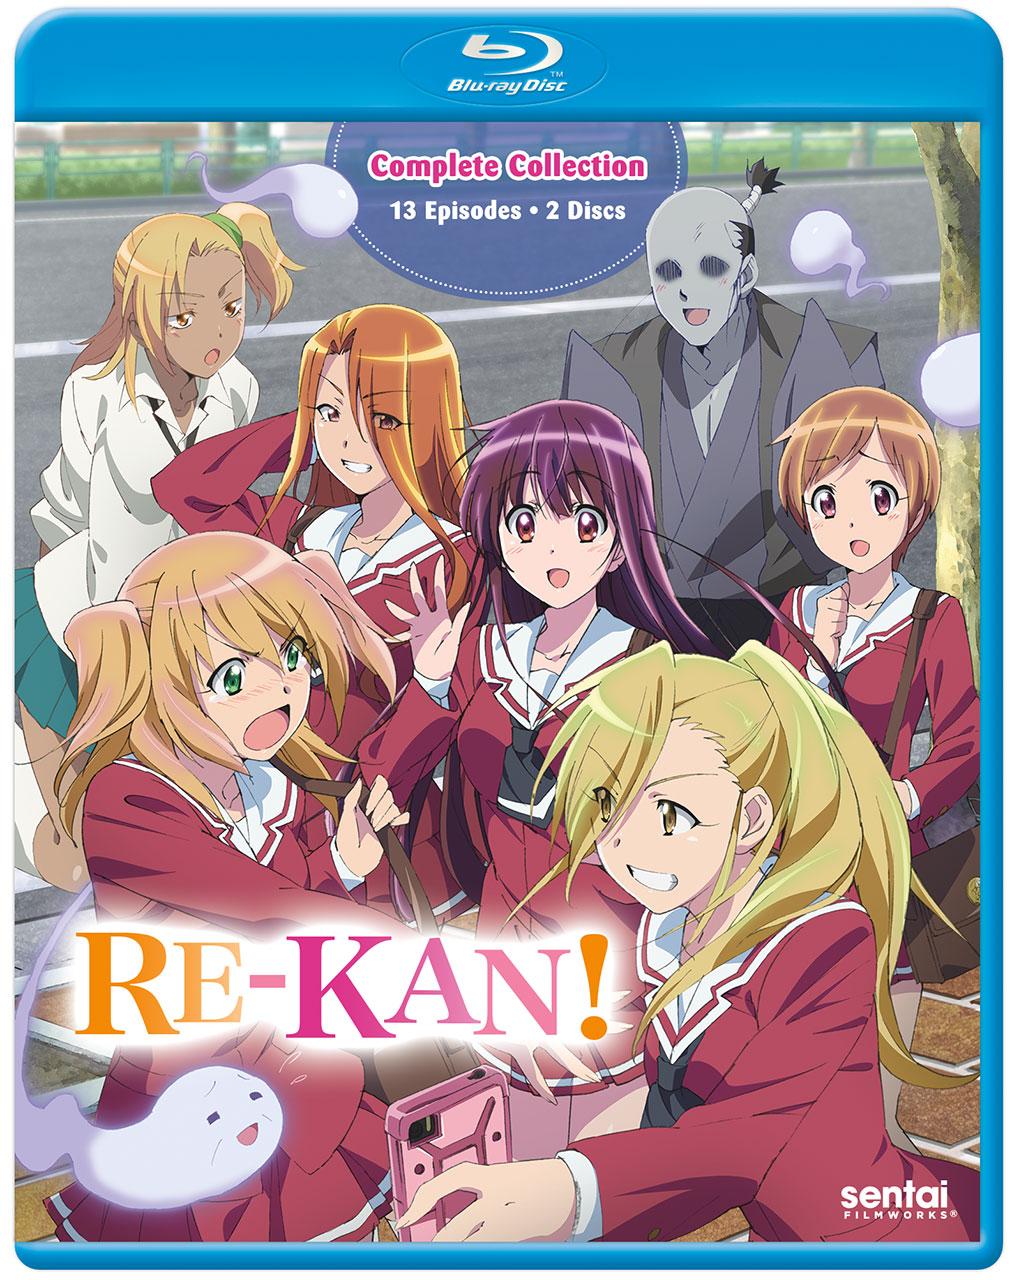 RE-KAN! Blu-ray